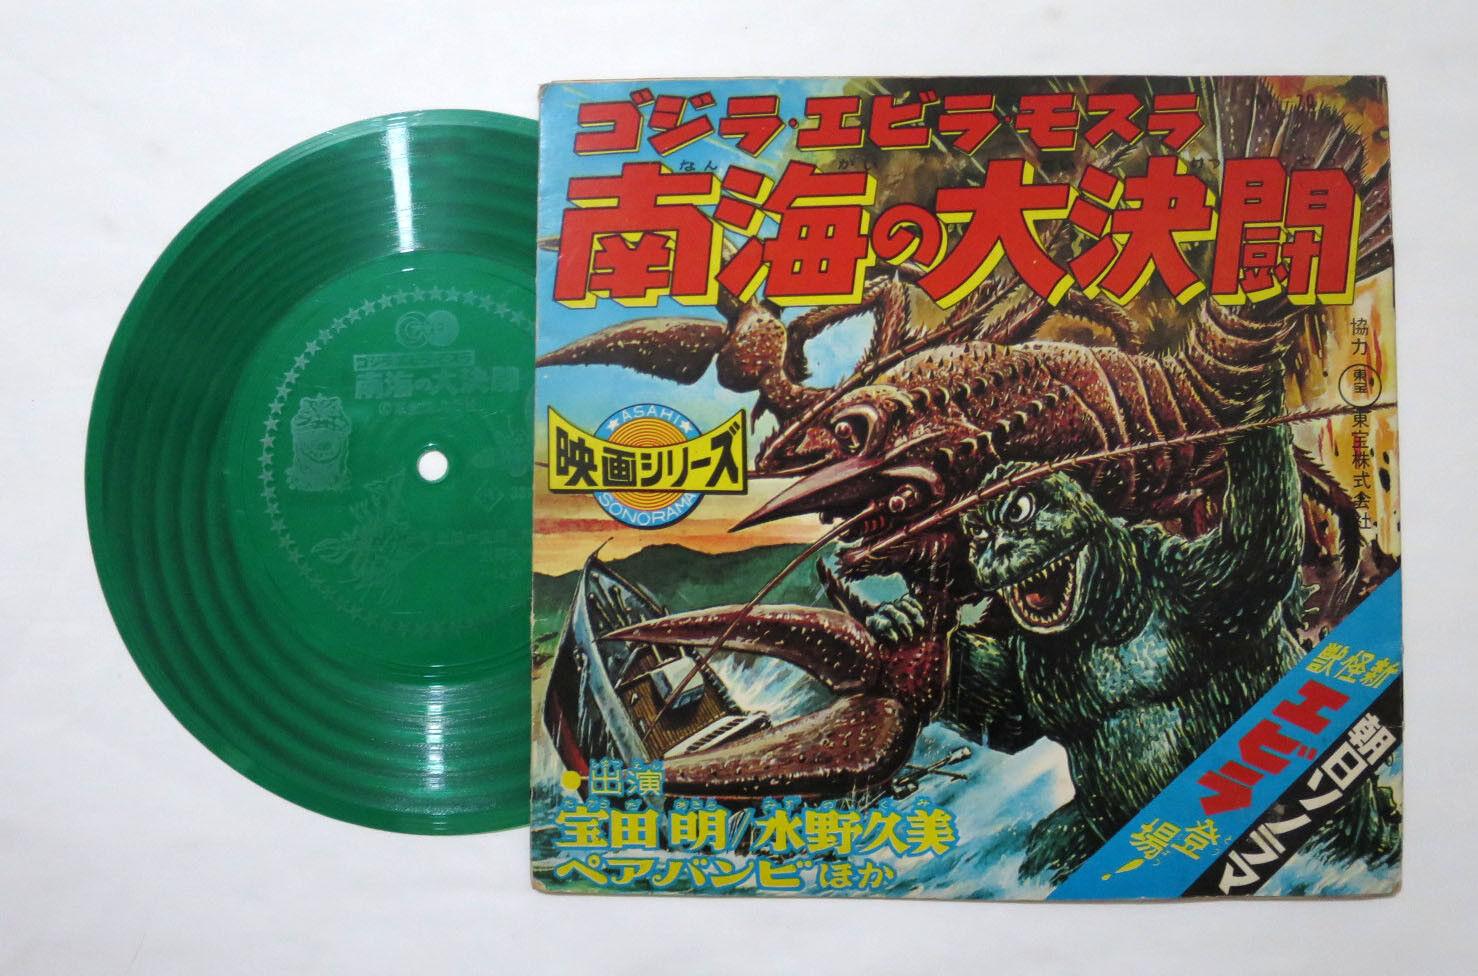 Godzilla Ebirah Mothra Kaiju Duel Book + Record Set Asahi Japan Vintage 1966